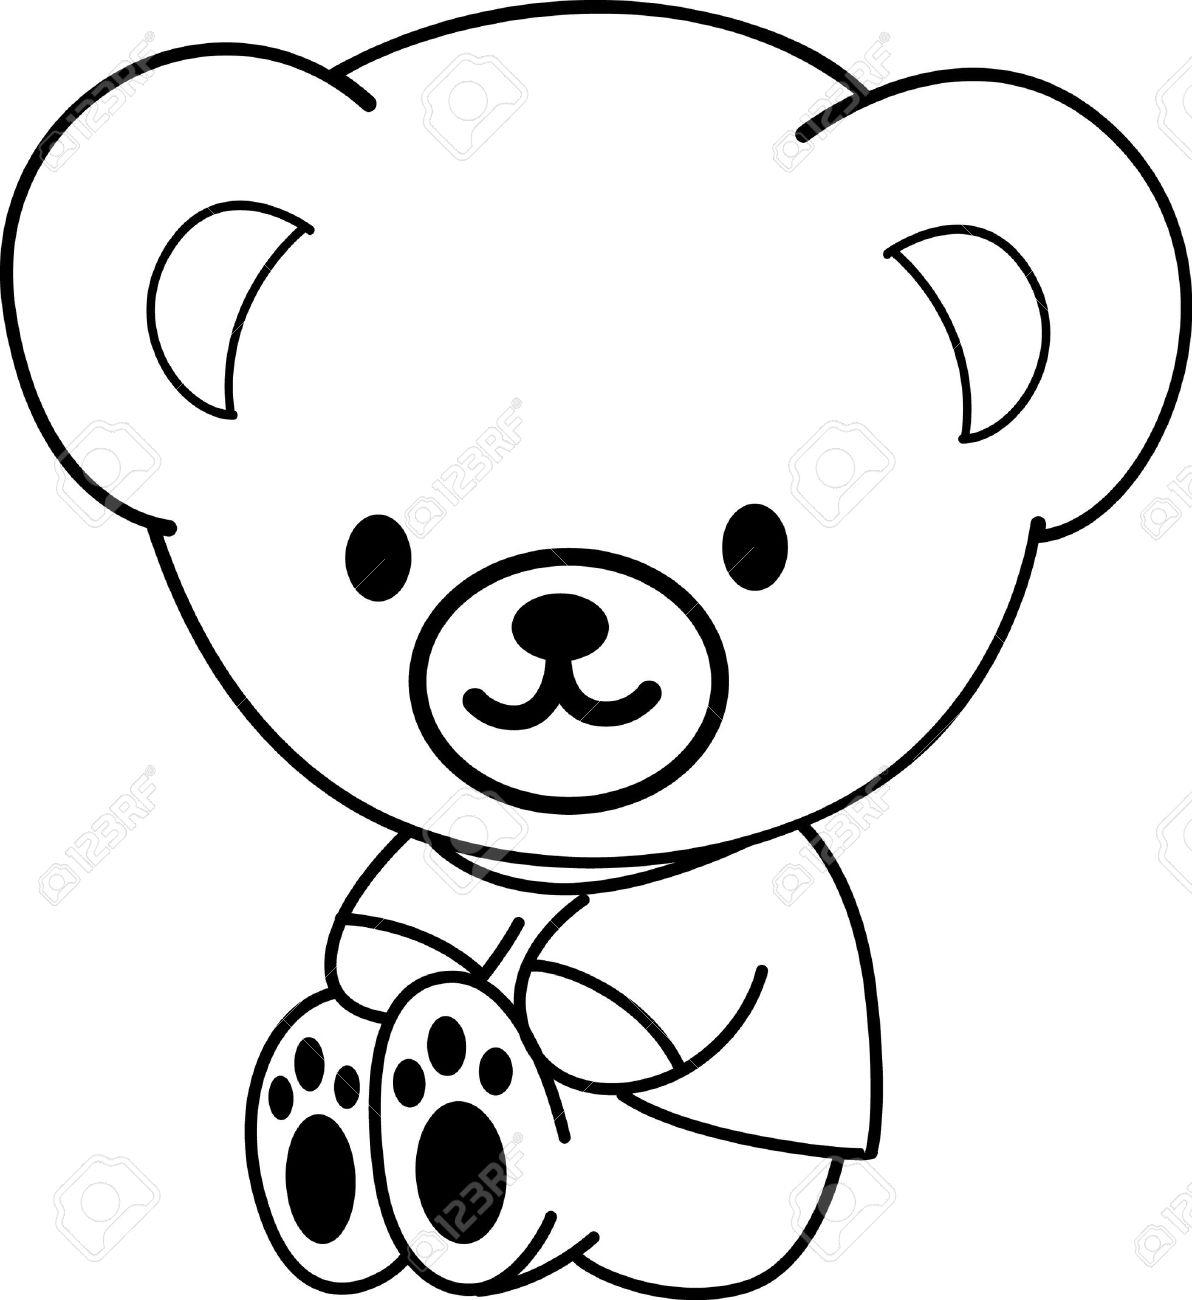 1192x1300 Cartoon Bear Drawing How To Draw A Cartoon Teddy Bear Kids